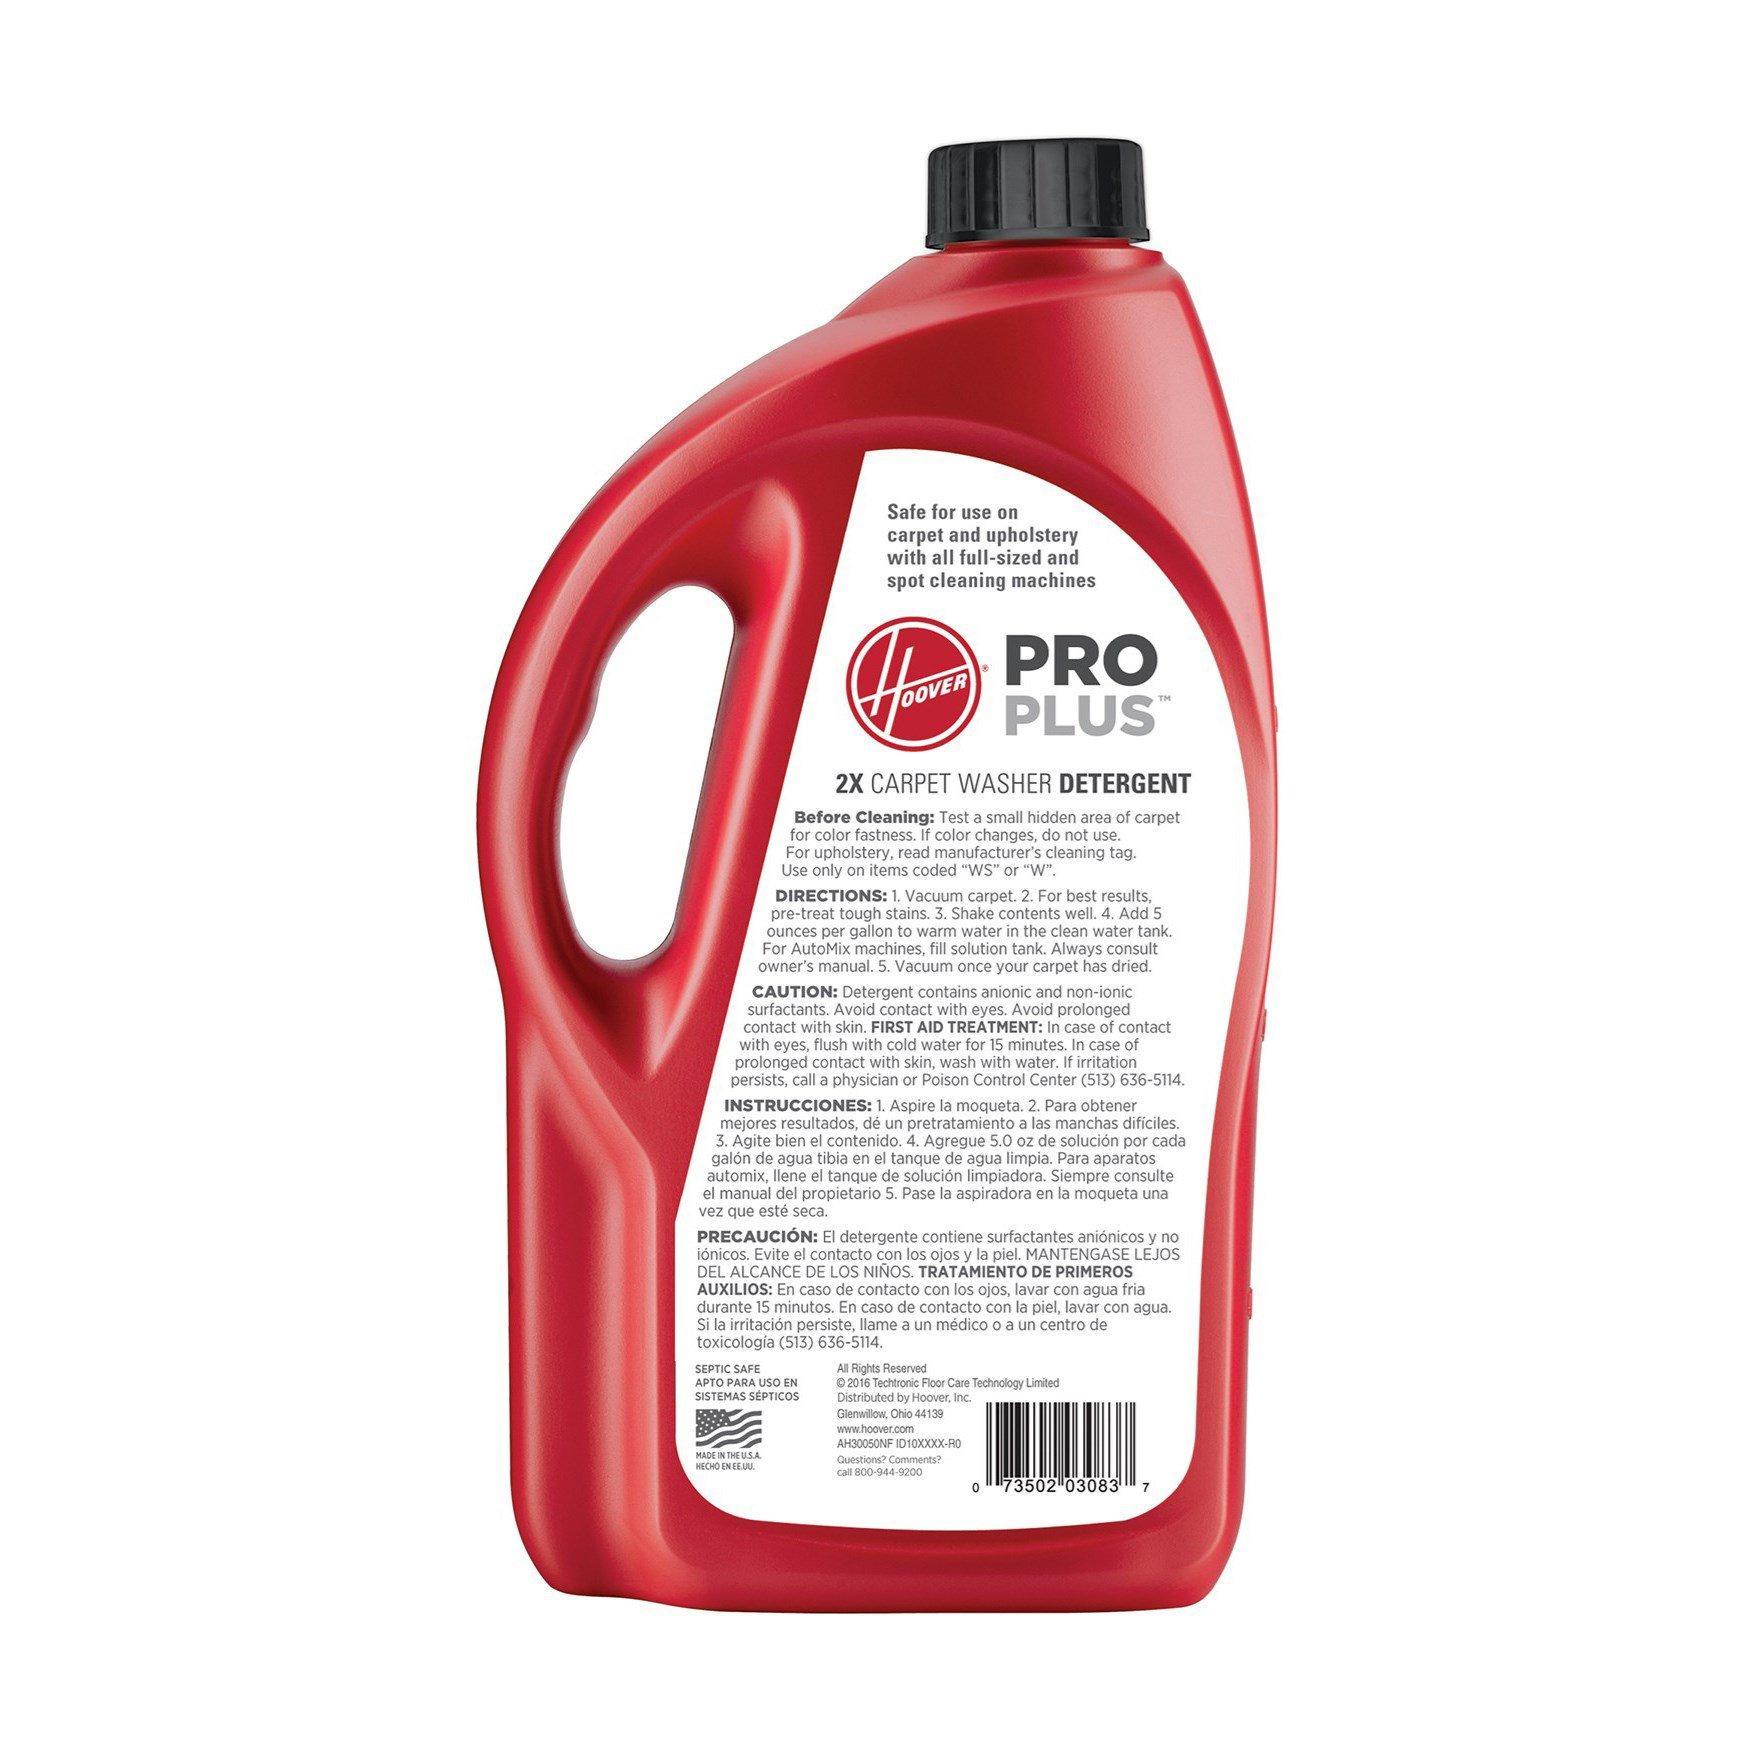 64 oz. Pro Plus 2X Carpet Washer Solution2